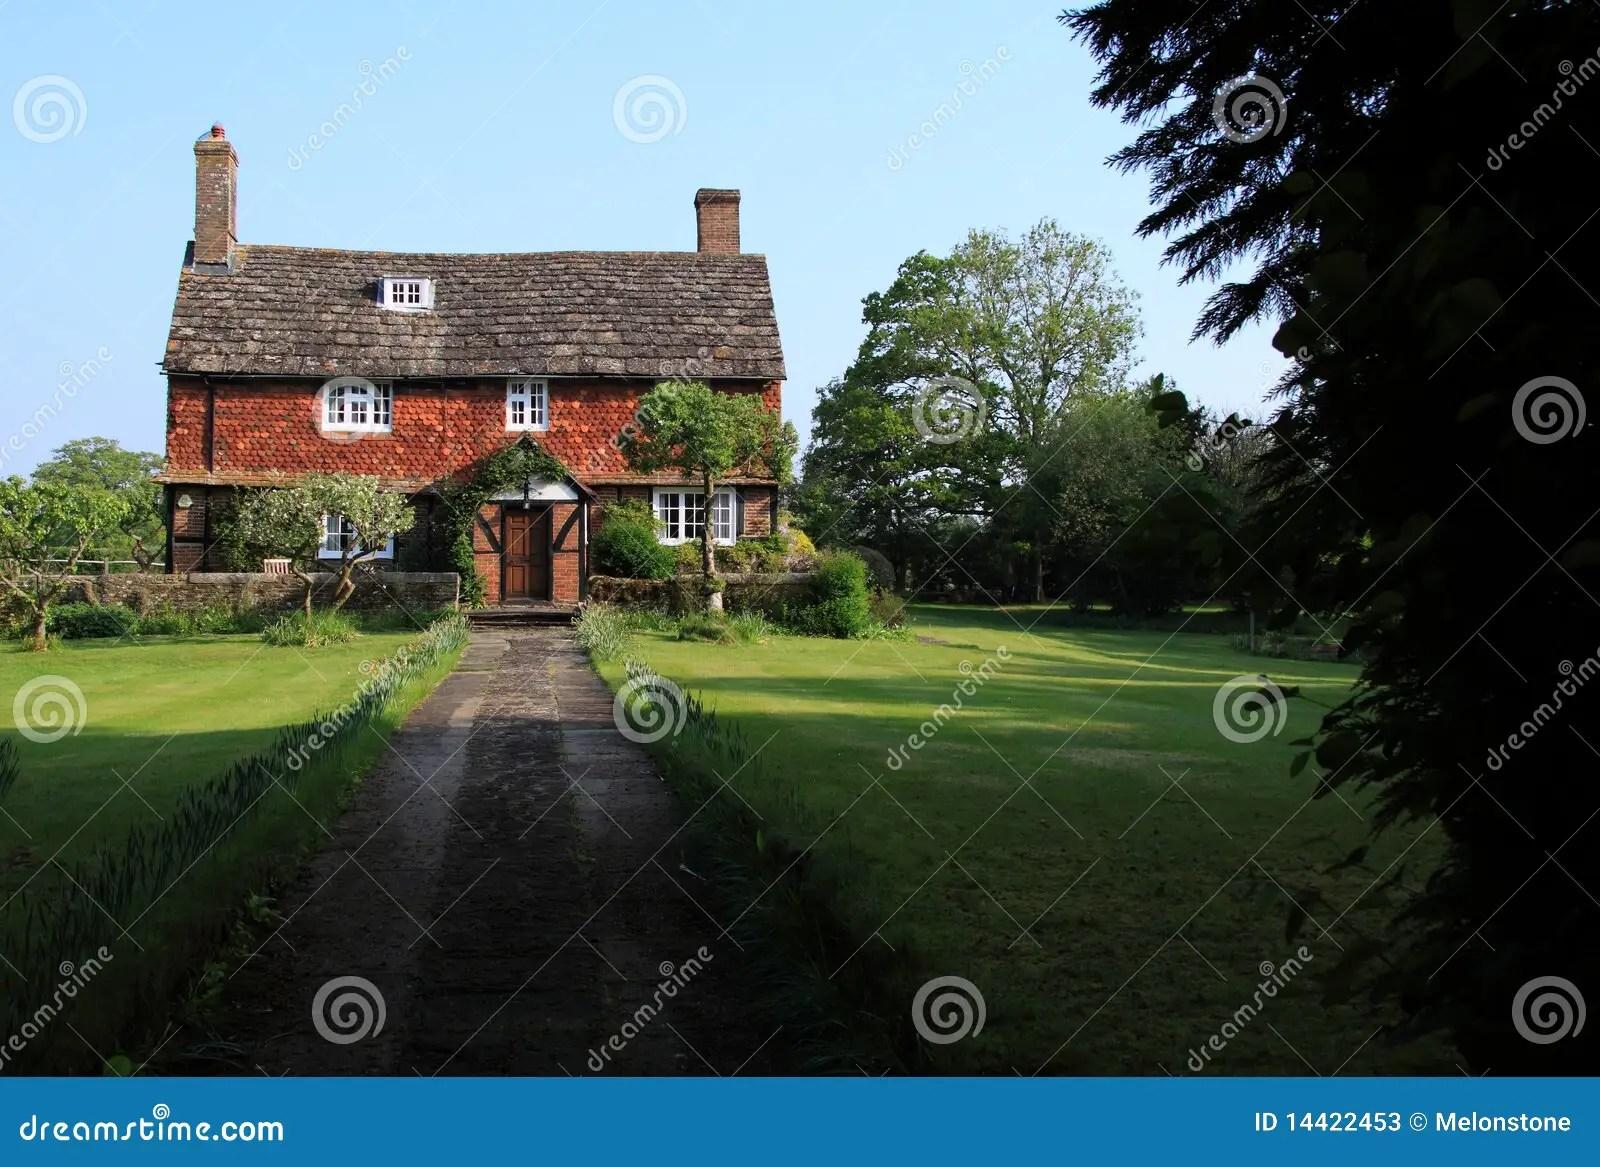 Old Historic English Farmhouse Stock Image Image Of